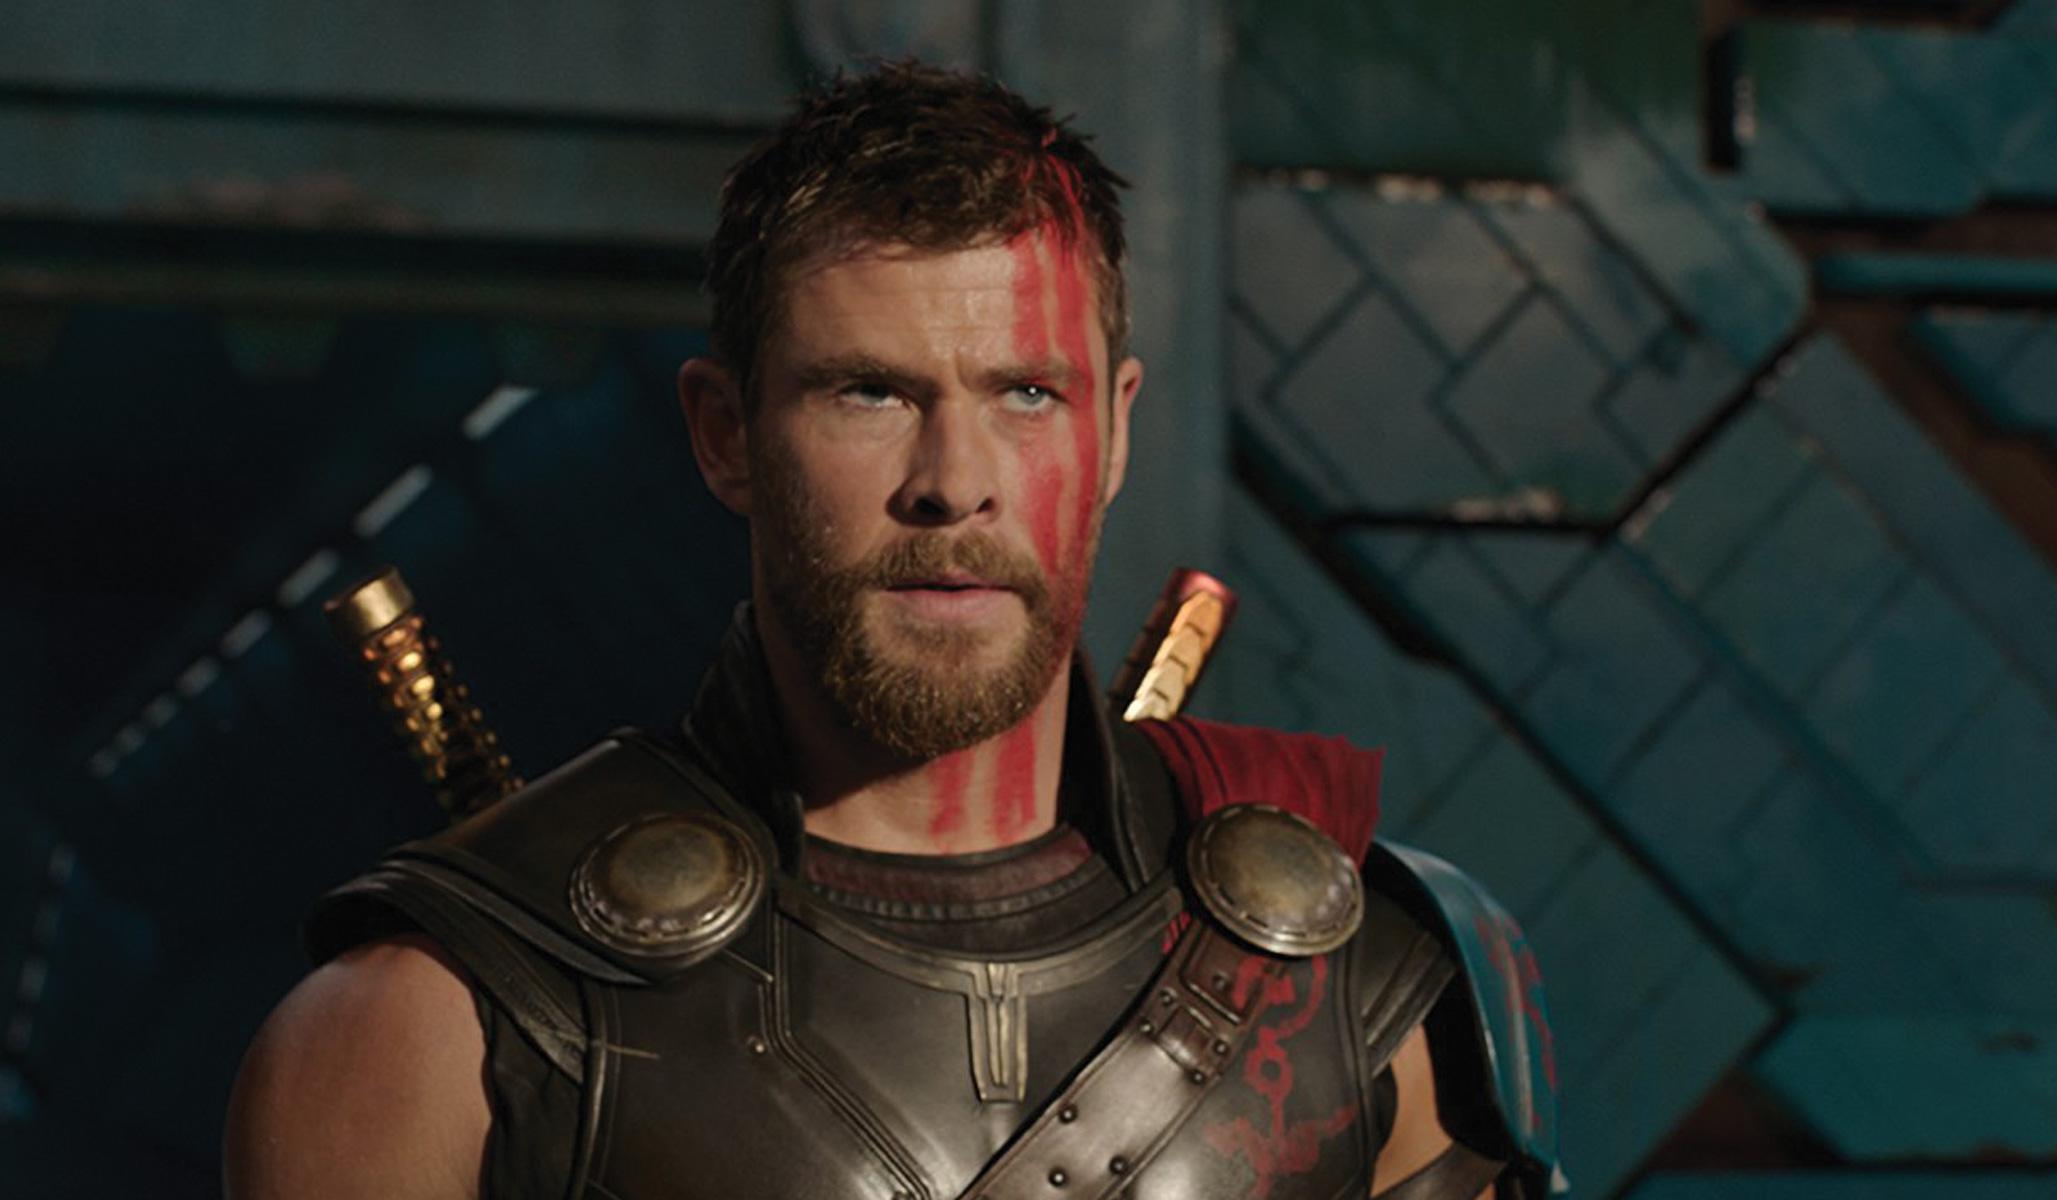 the Thor: Ragnarok (English) full movie 2015 download